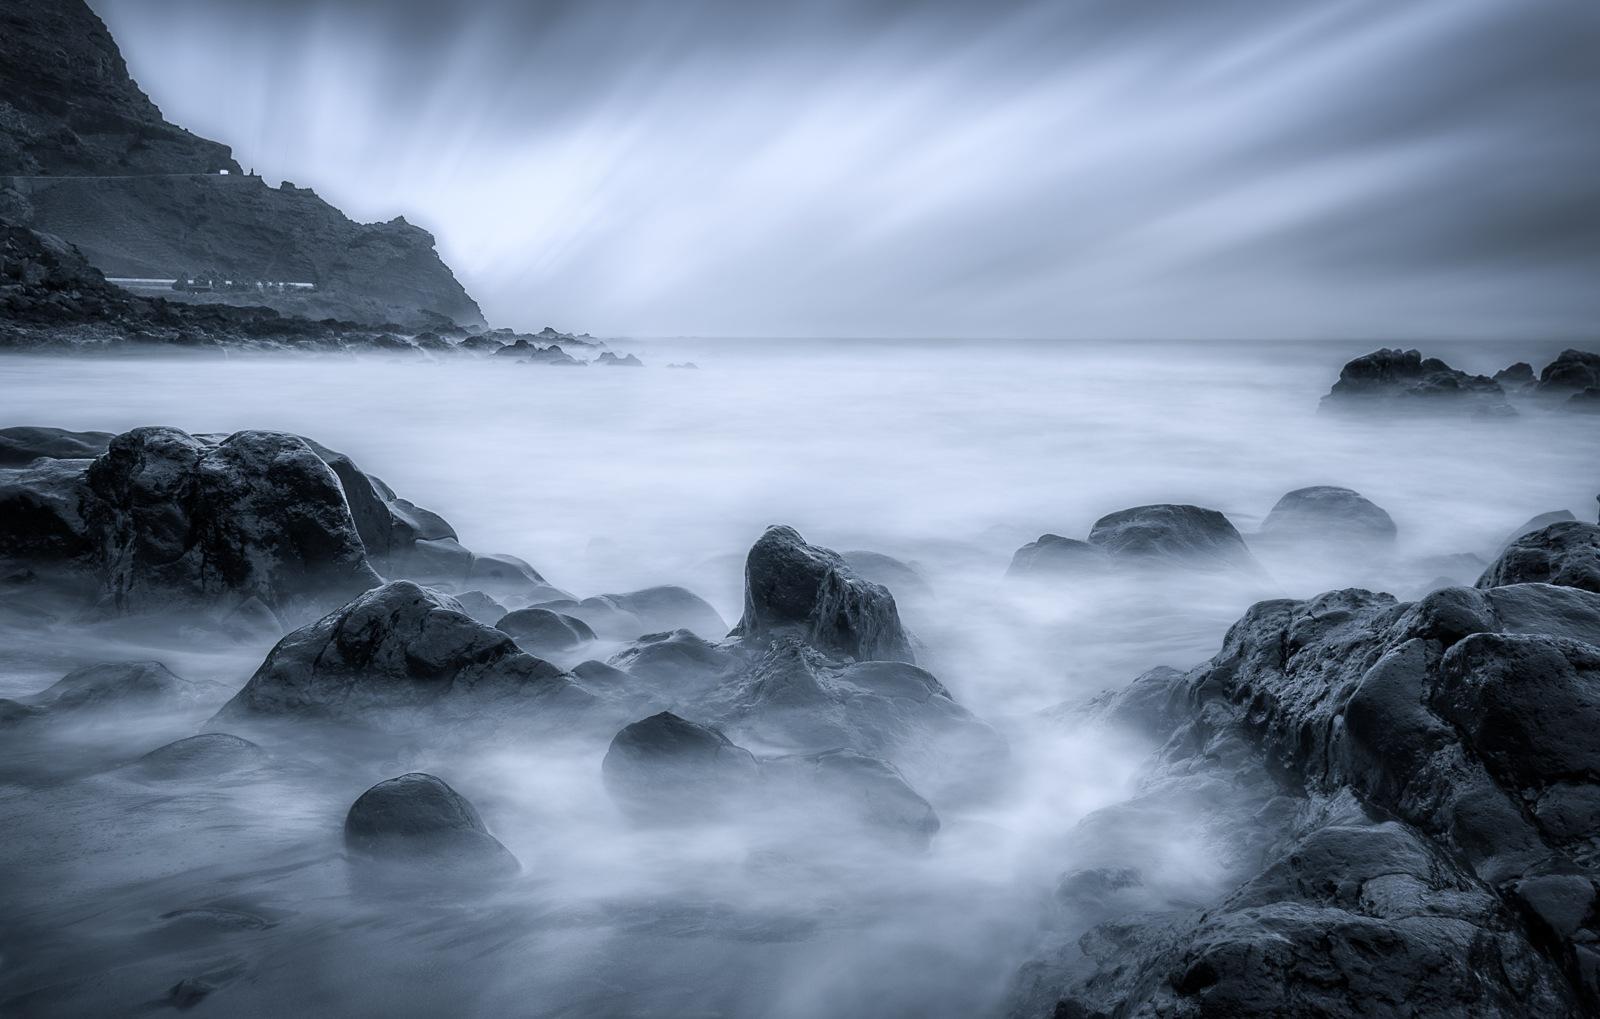 Ocean dreams by Mantas Kazlauskas